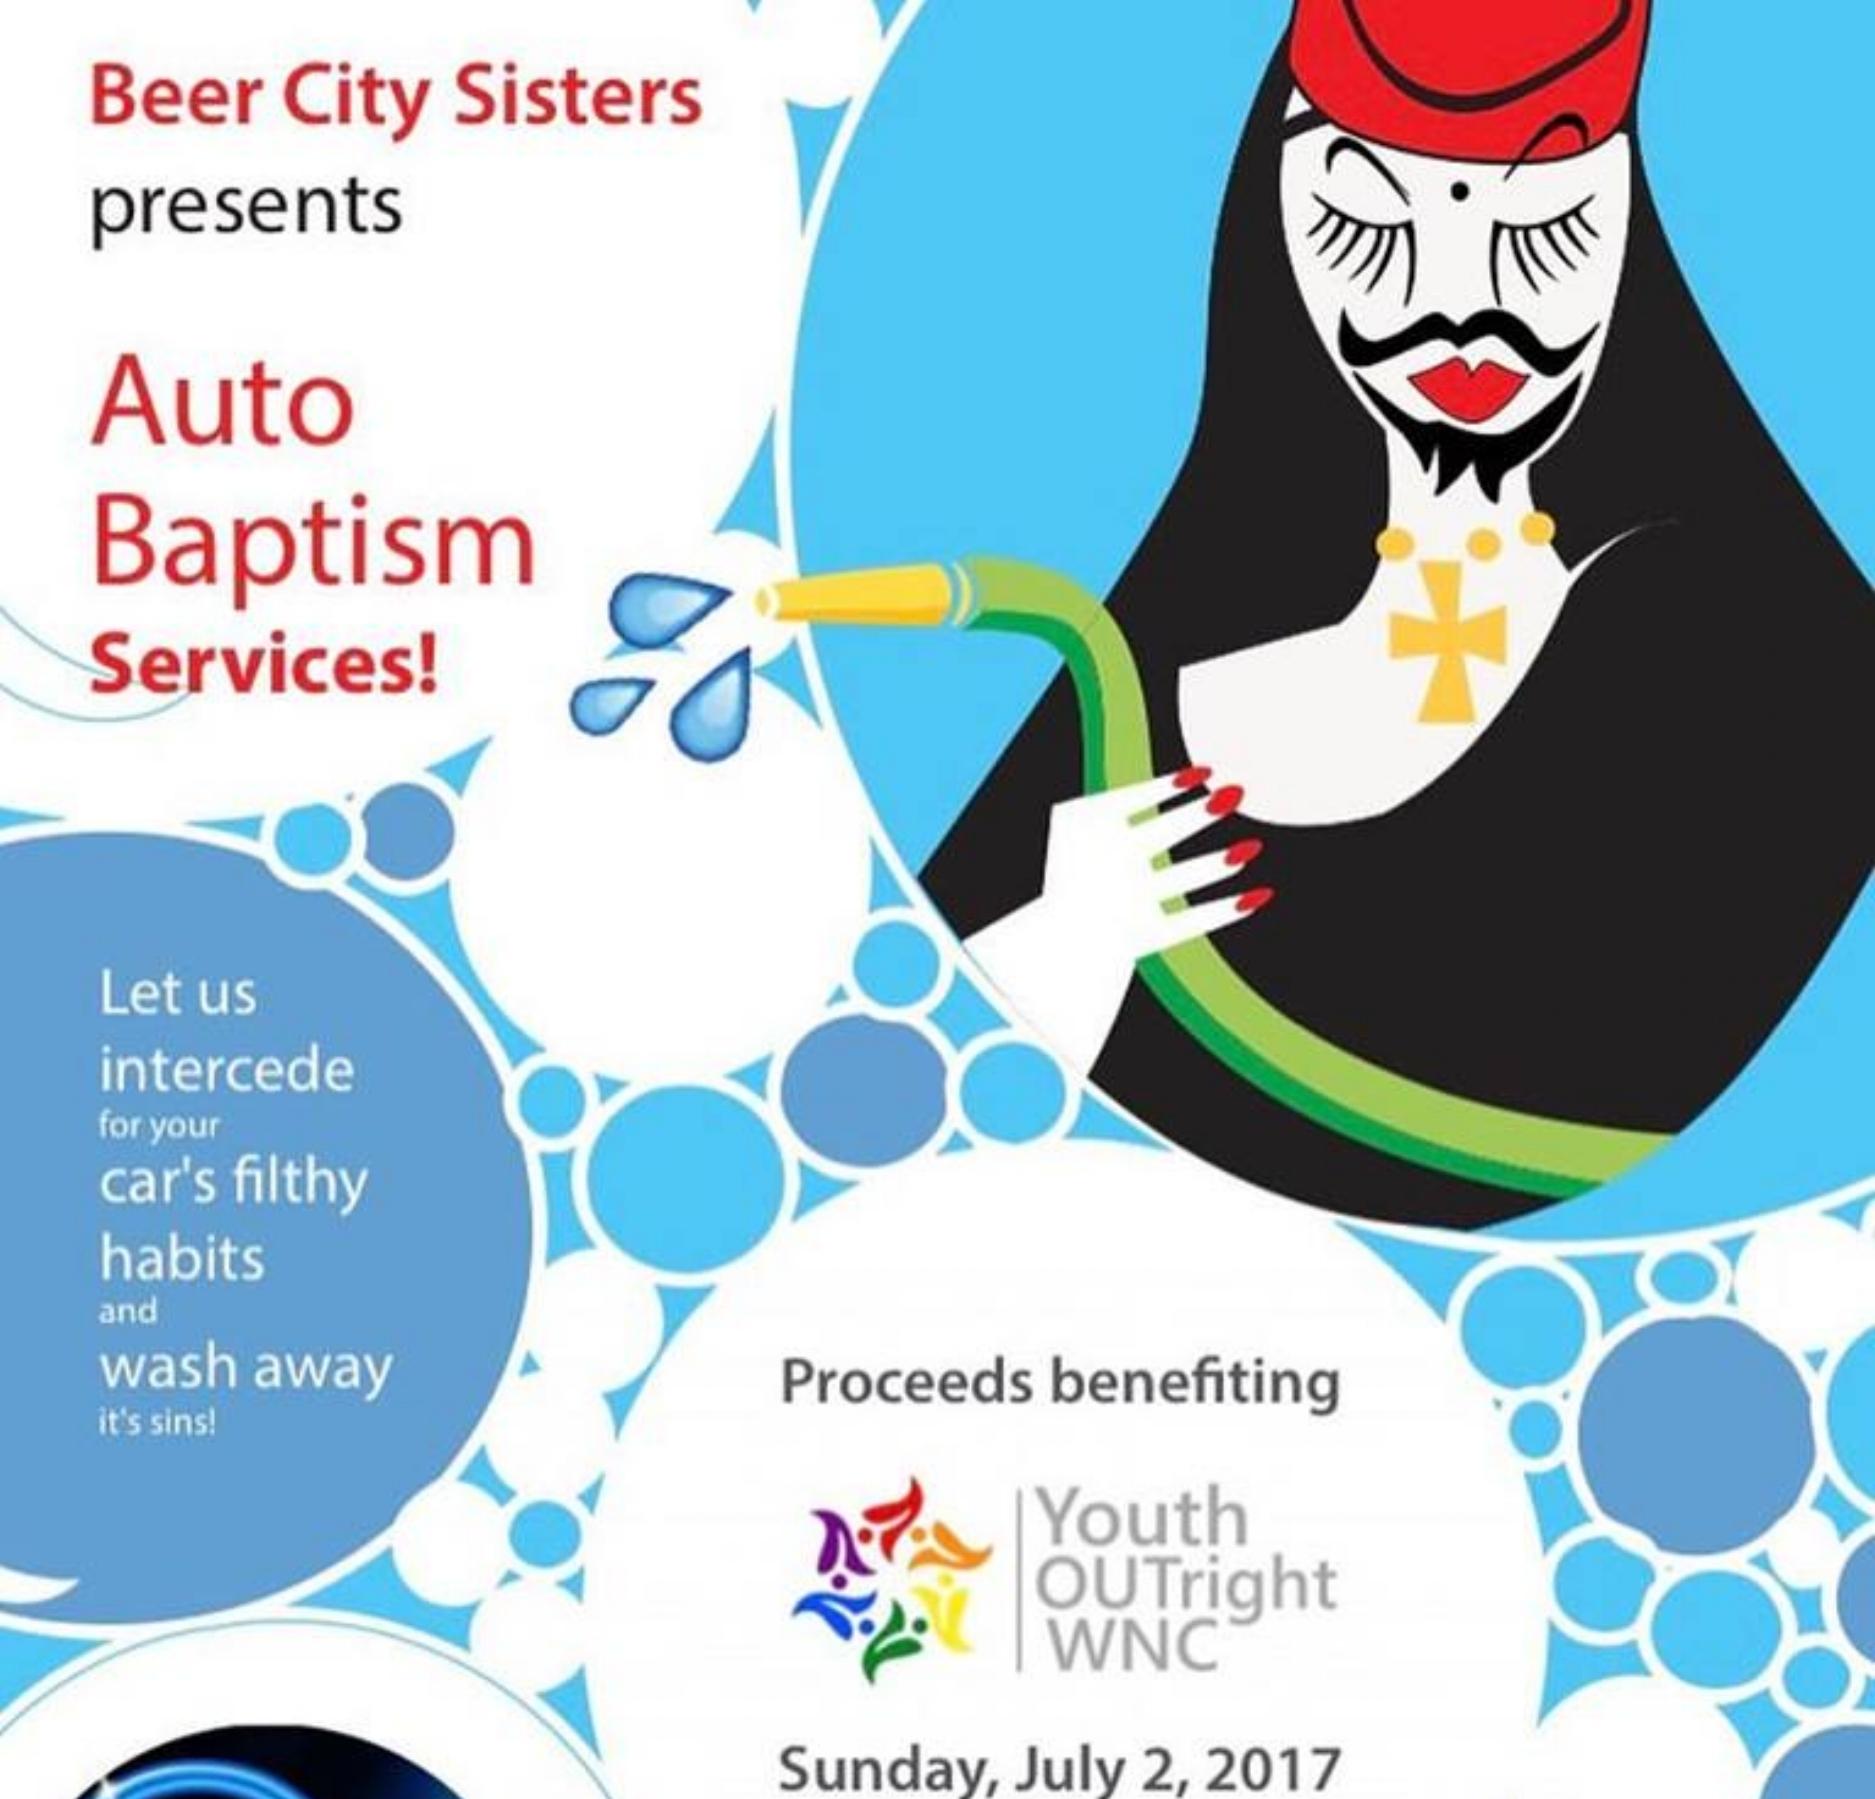 July 2, 2017 - Auto Baptism Services